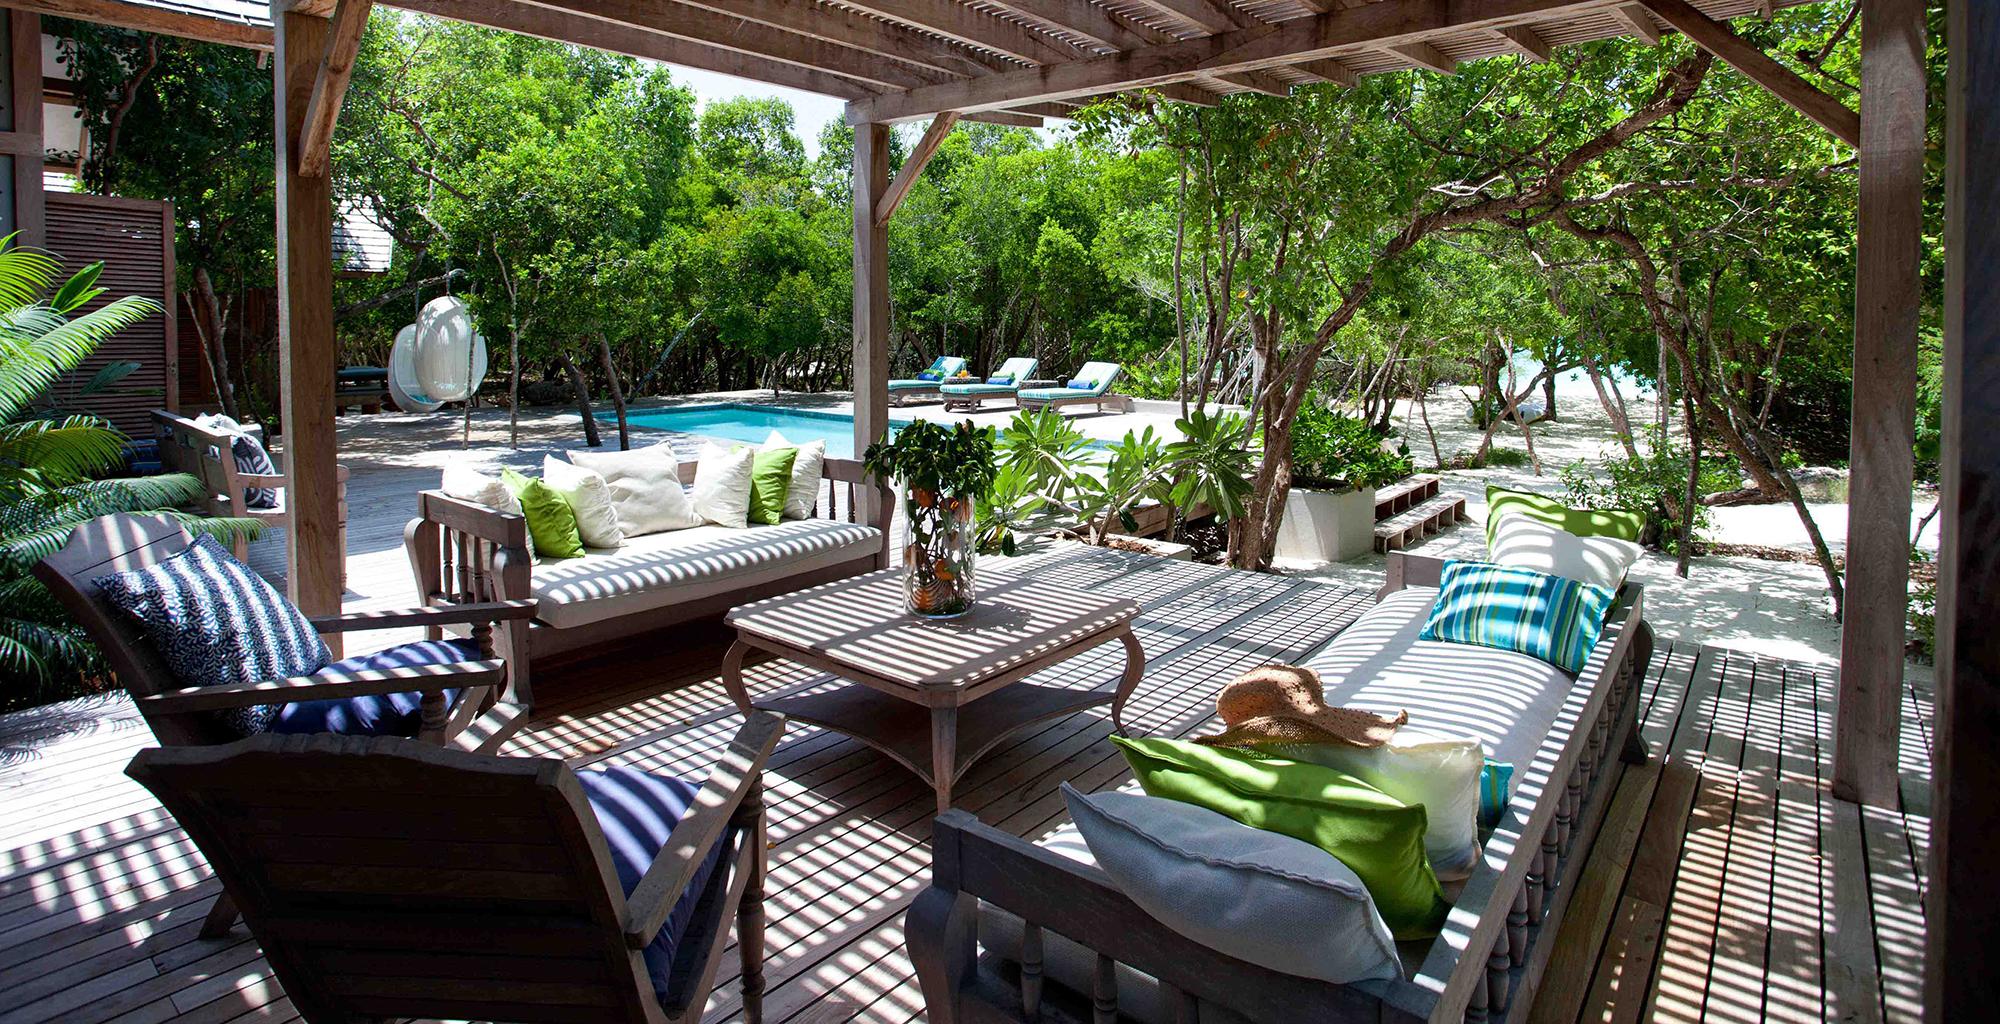 Mozambique-Quirimbas-Vamizi-Lodge-Deck